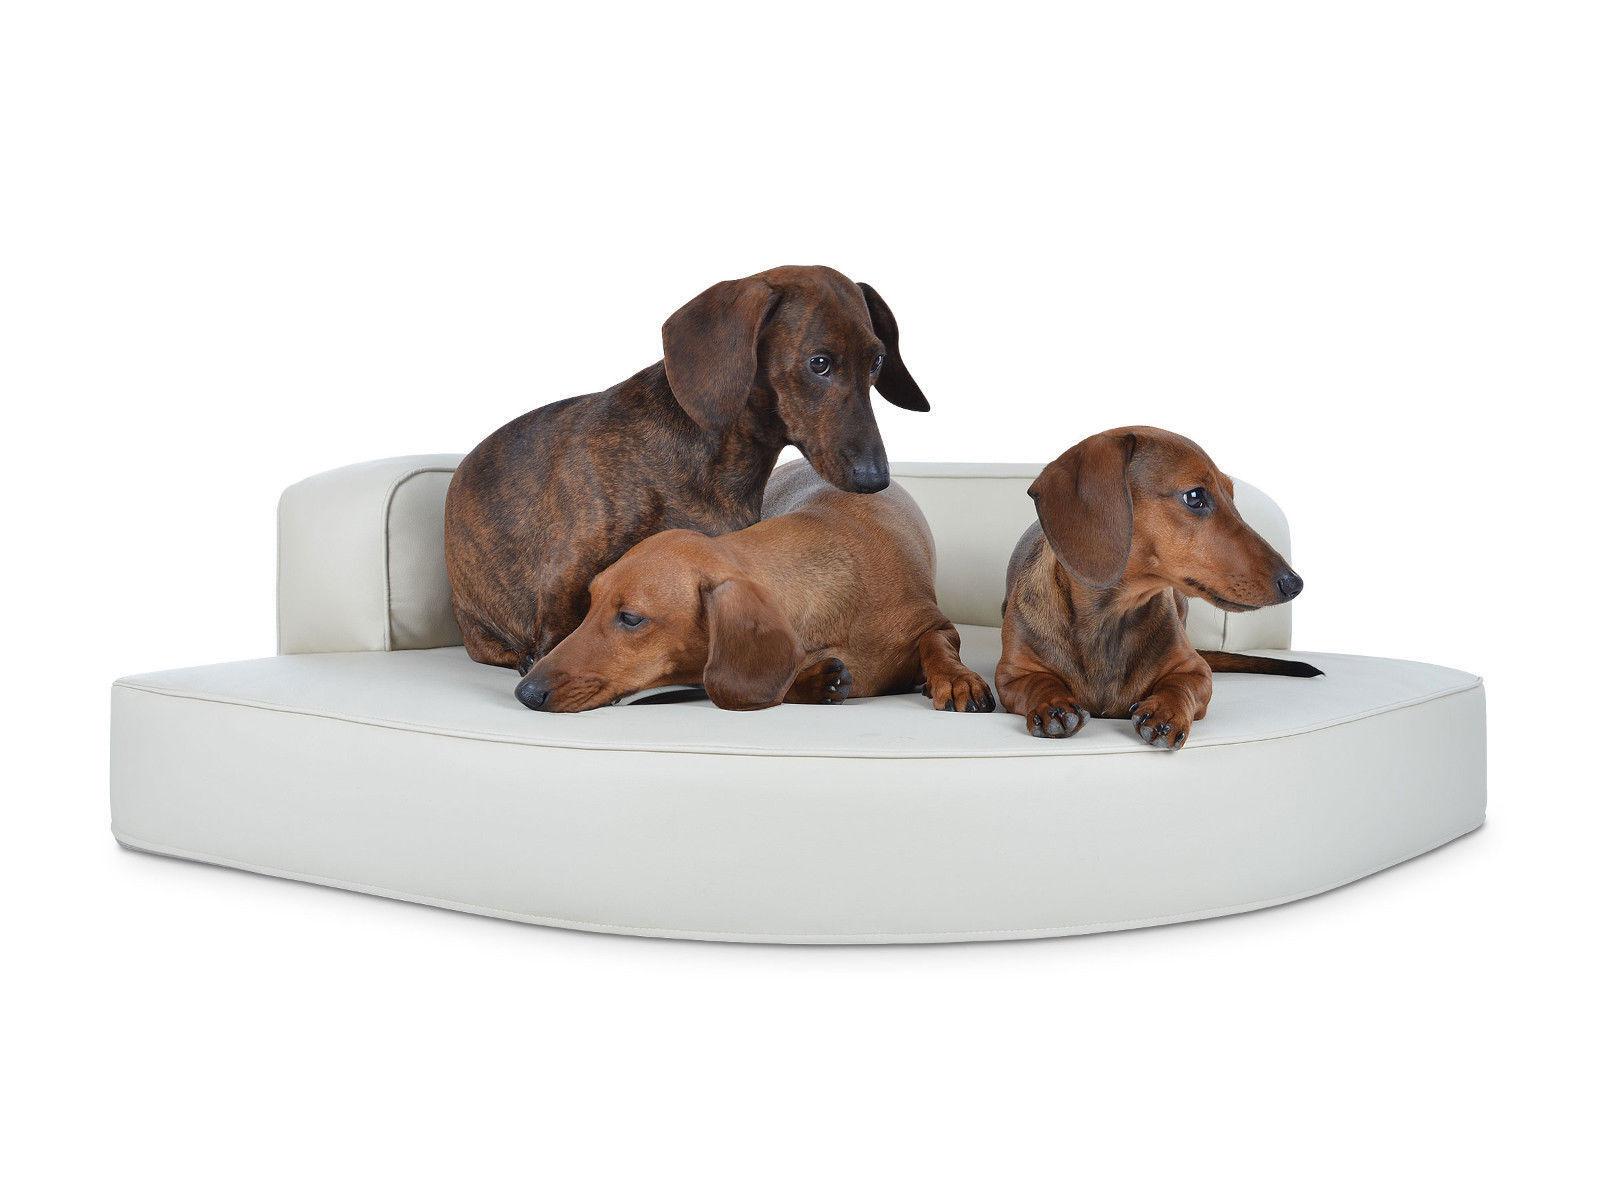 Top Padsforall Cama para para para Perro Cuero Artificial Sofá Cesta Esquina Mate M L XL 9aa73f